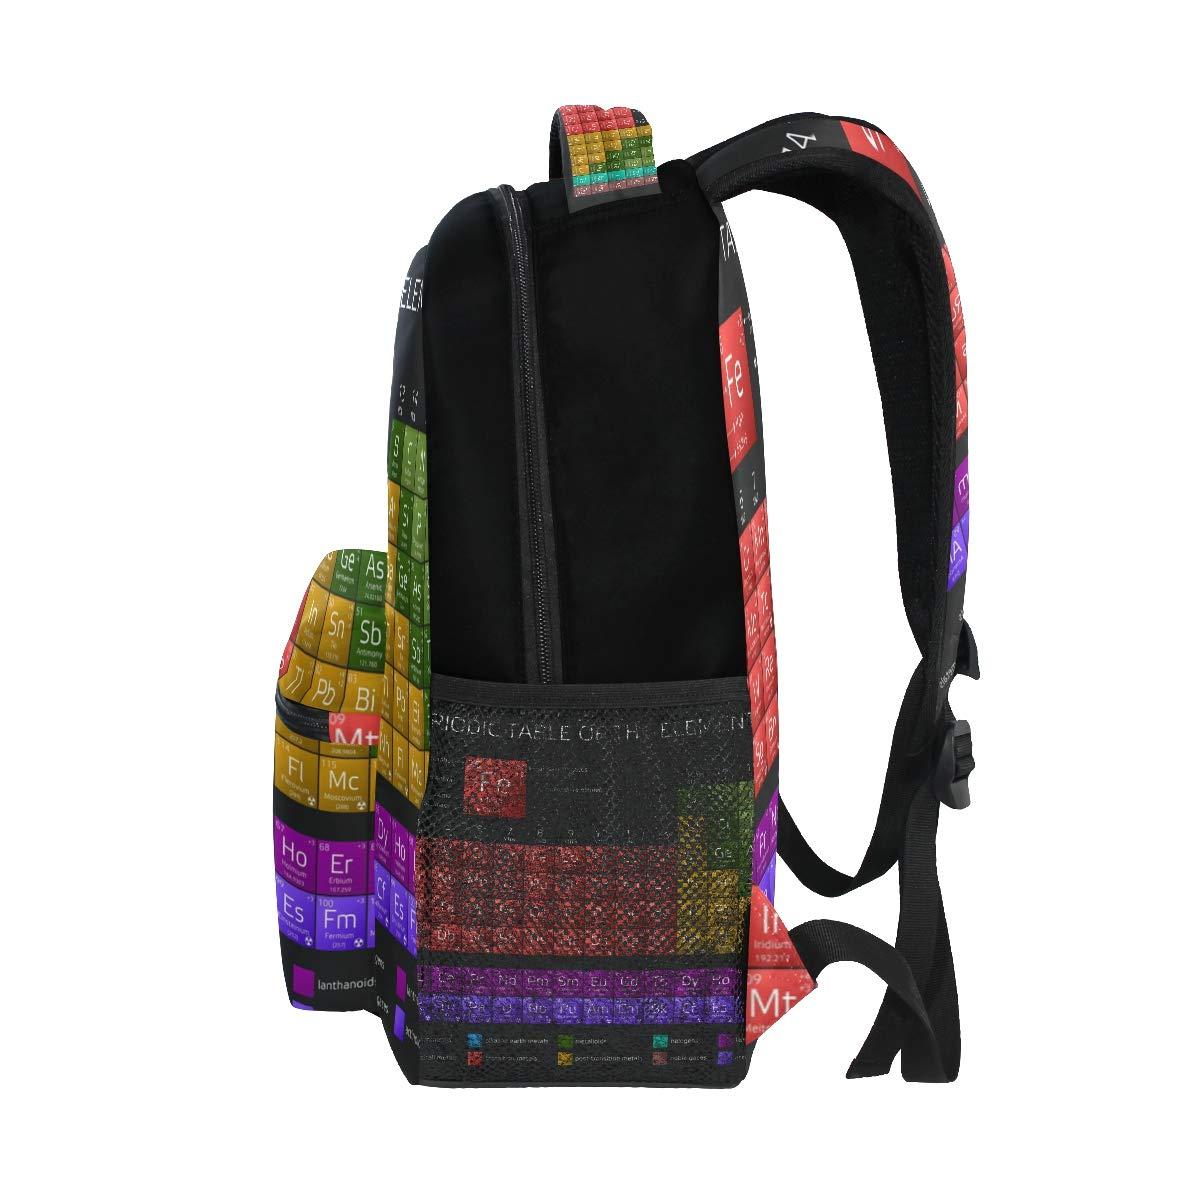 DOSHINE DOSHINE DOSHINE g15532562p203c237s337, Unisex-Erwachsene Kinderrucksack Mehrfarbig Mehrfarbig 11.5''x8''x16'' B07MBGC572 Kinderruckscke Optimaler Preis 6b7b87